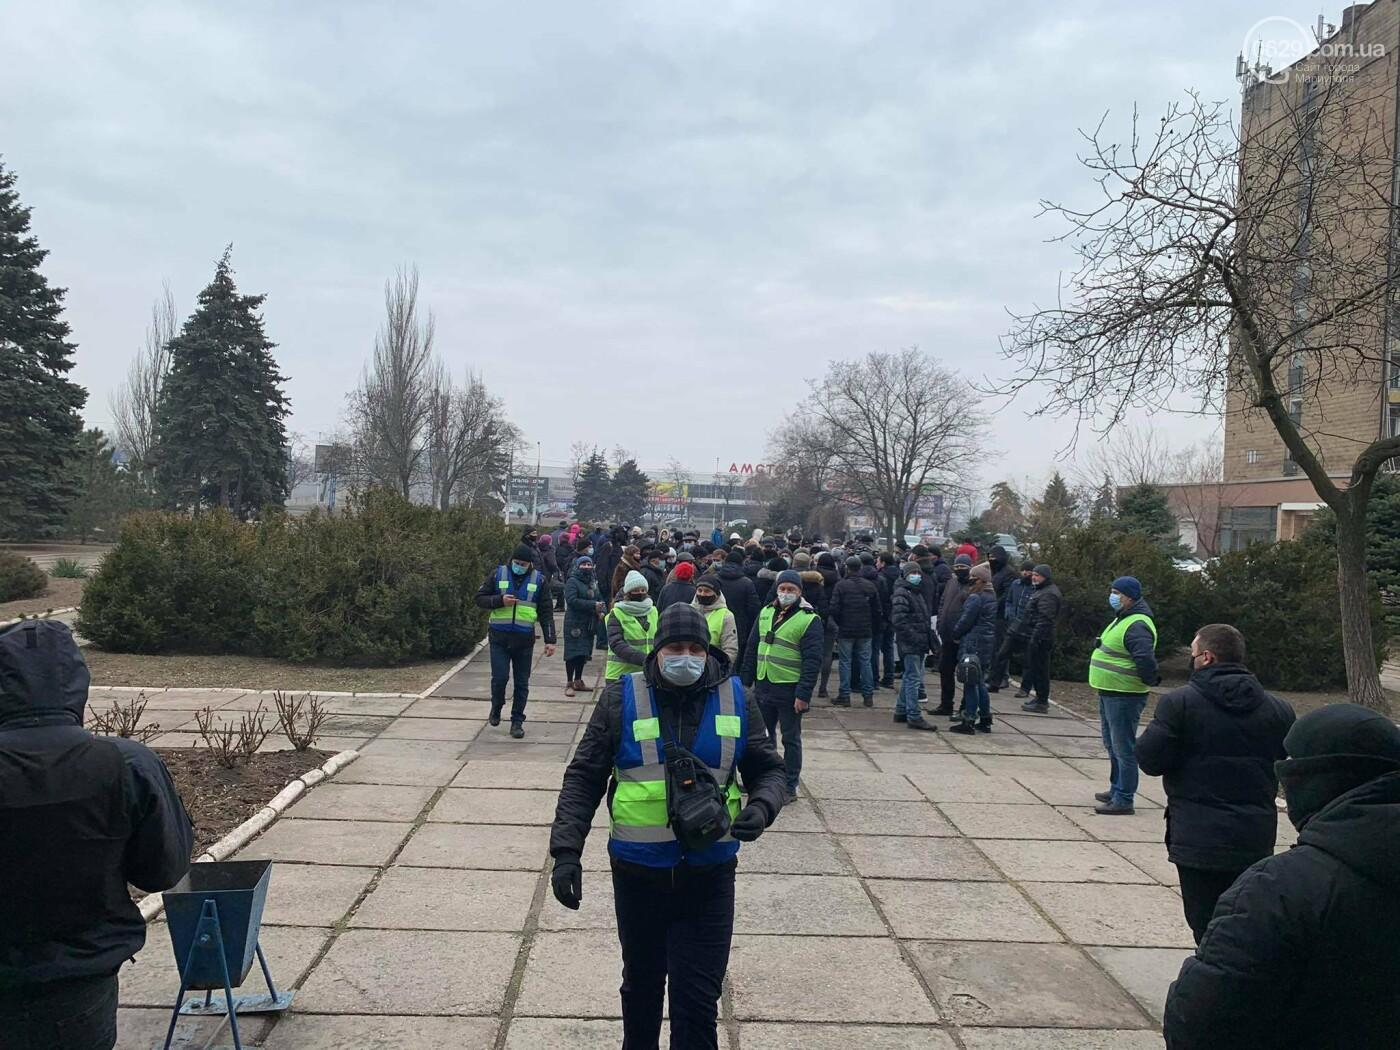 В Мариуполе стартовала сессия горсовета: работники СРЗ устроили митинг, - ФОТО, фото-9